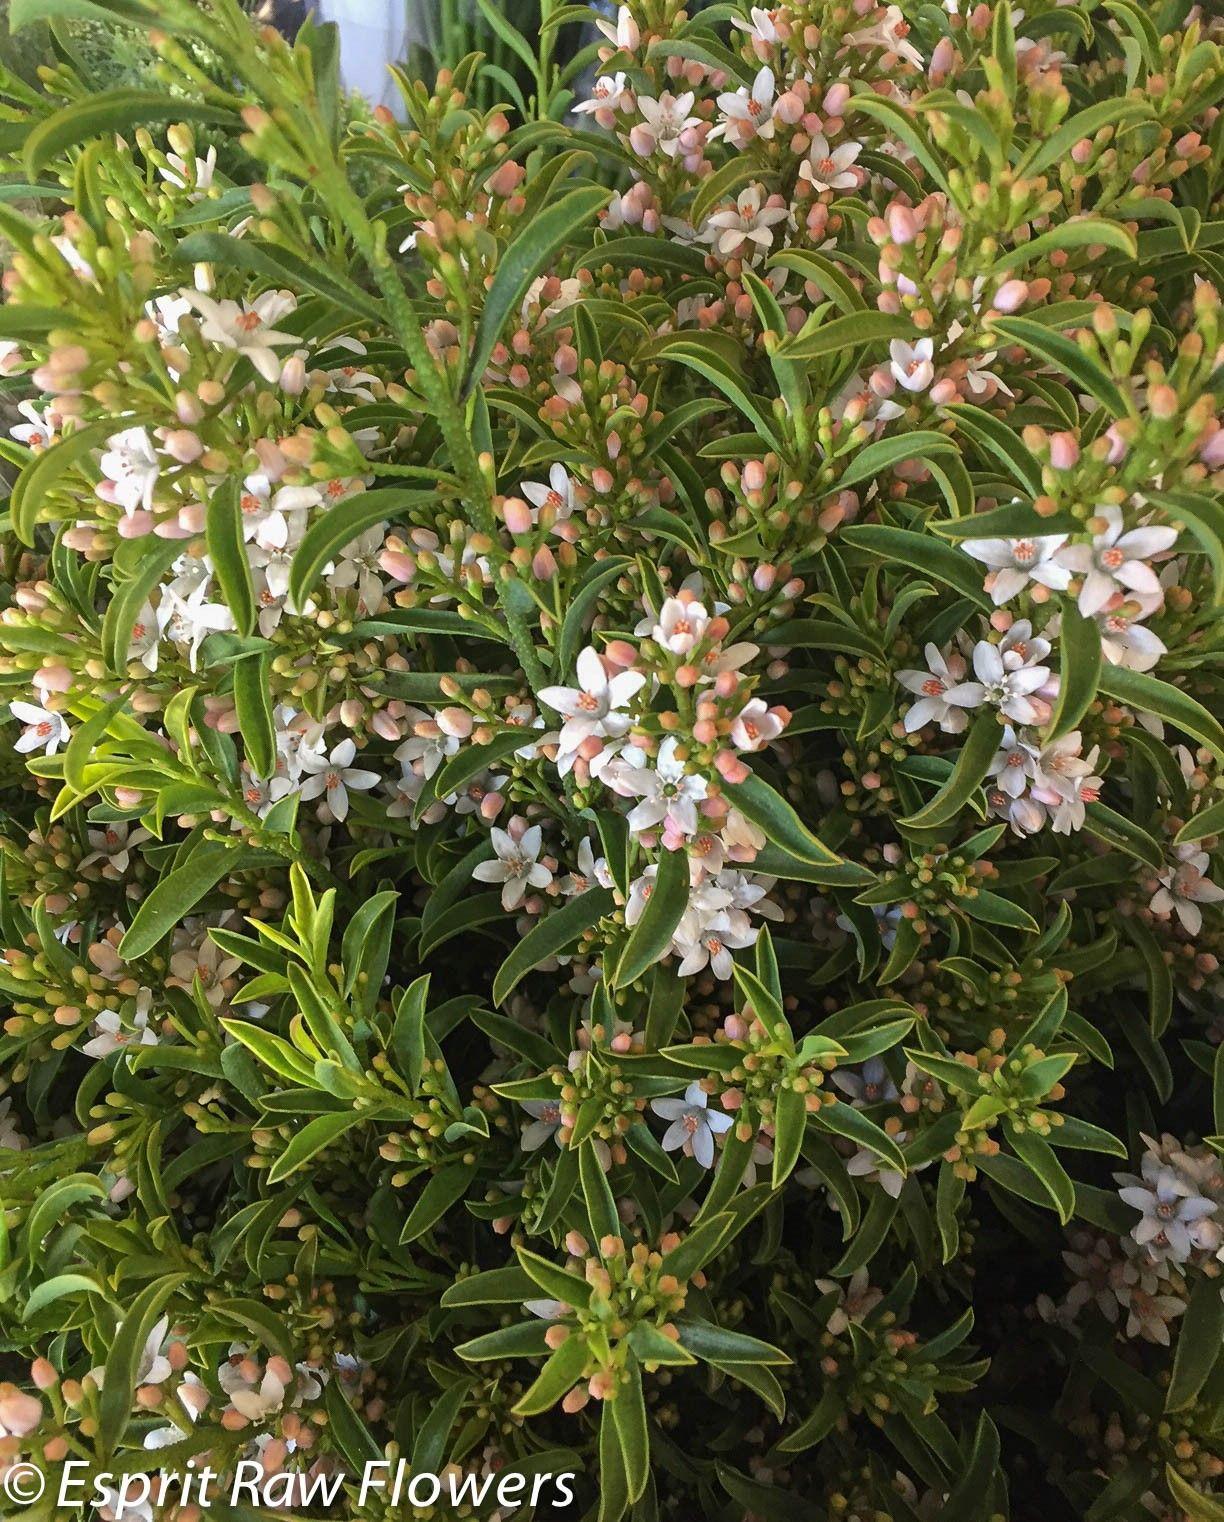 Eriostemon Flower Girl A Great Hardy Filler A Fresh Bushy